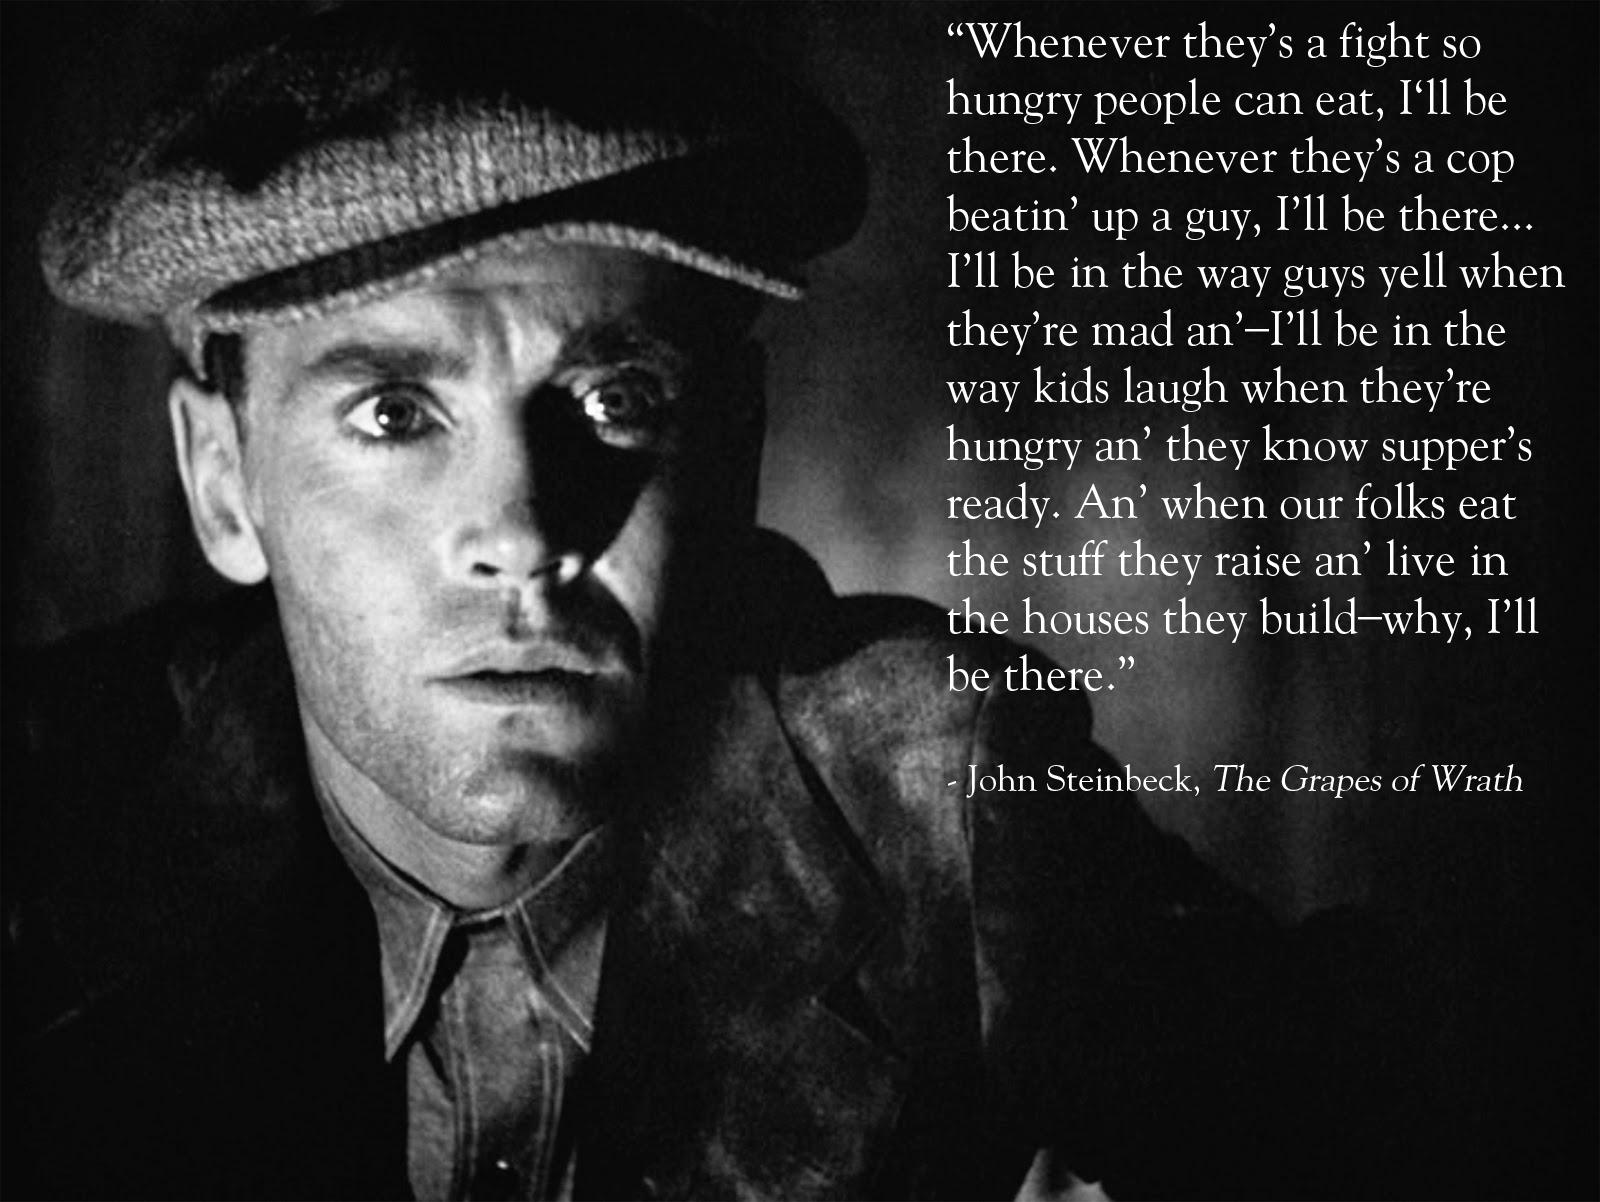 John Steinbeck's Grapes of Wrath: Tom Joad Character